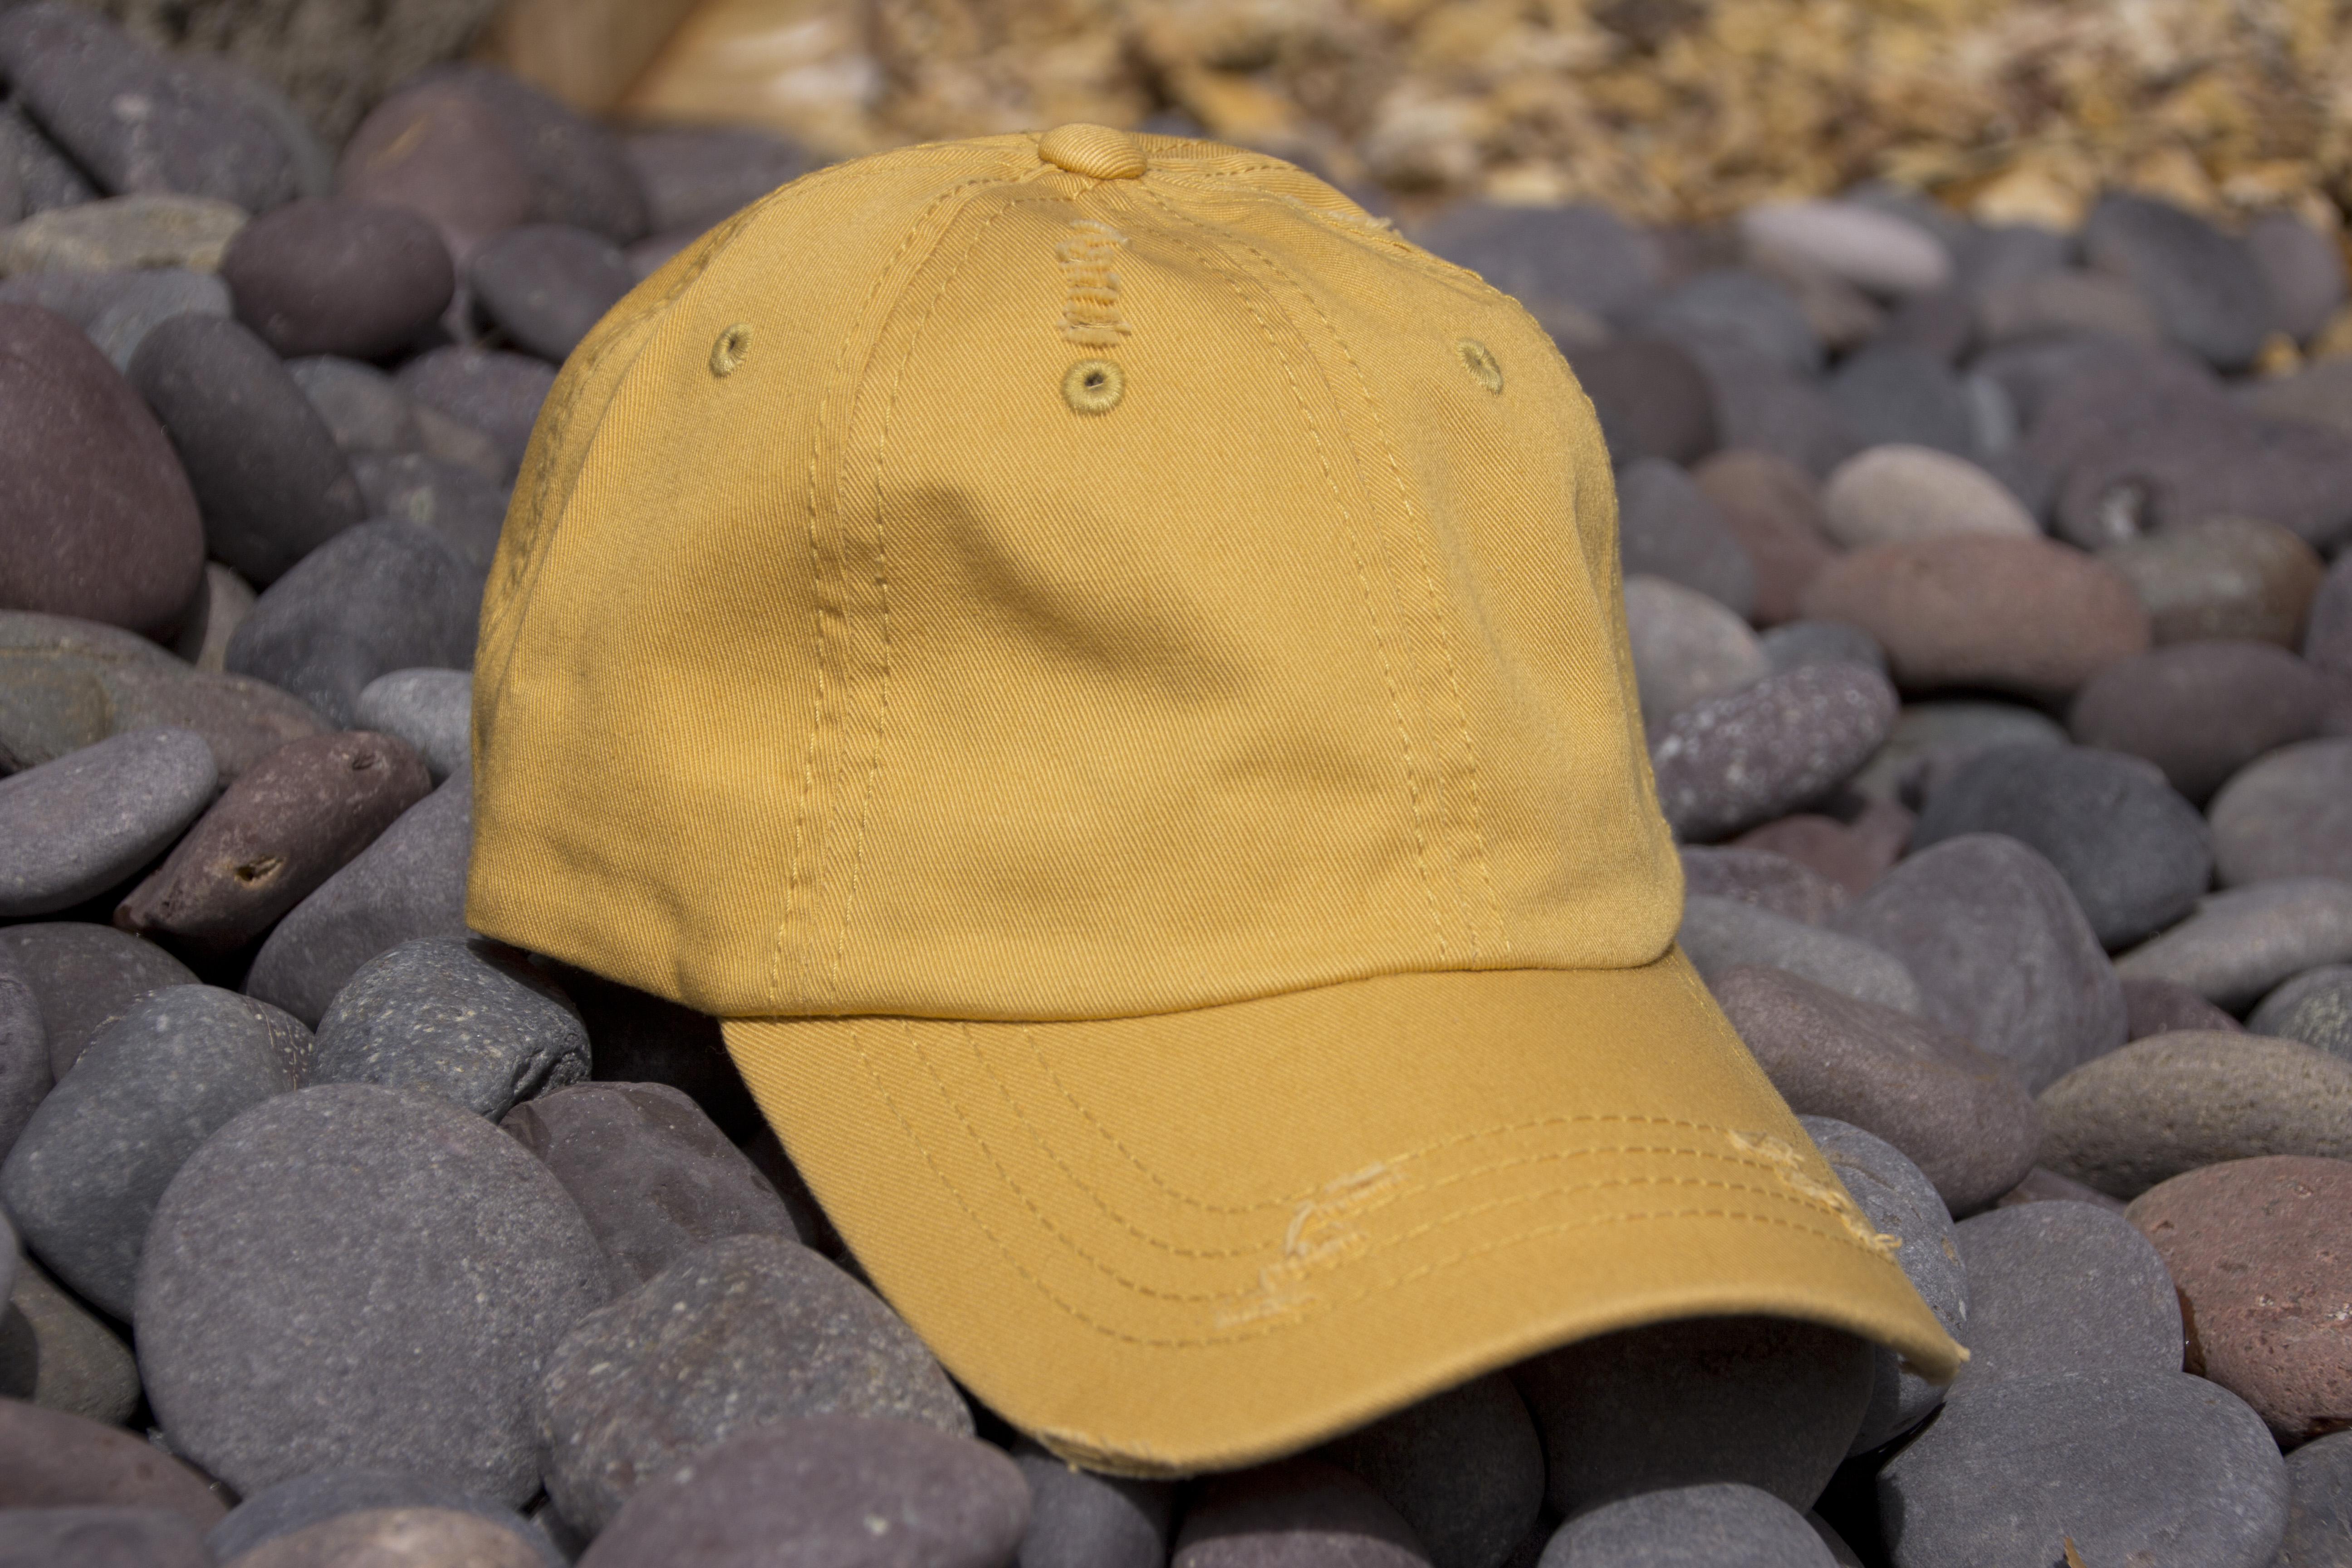 d4c386e09b9 Lot of 12 Mustard Vintage Frayed Dad Hats